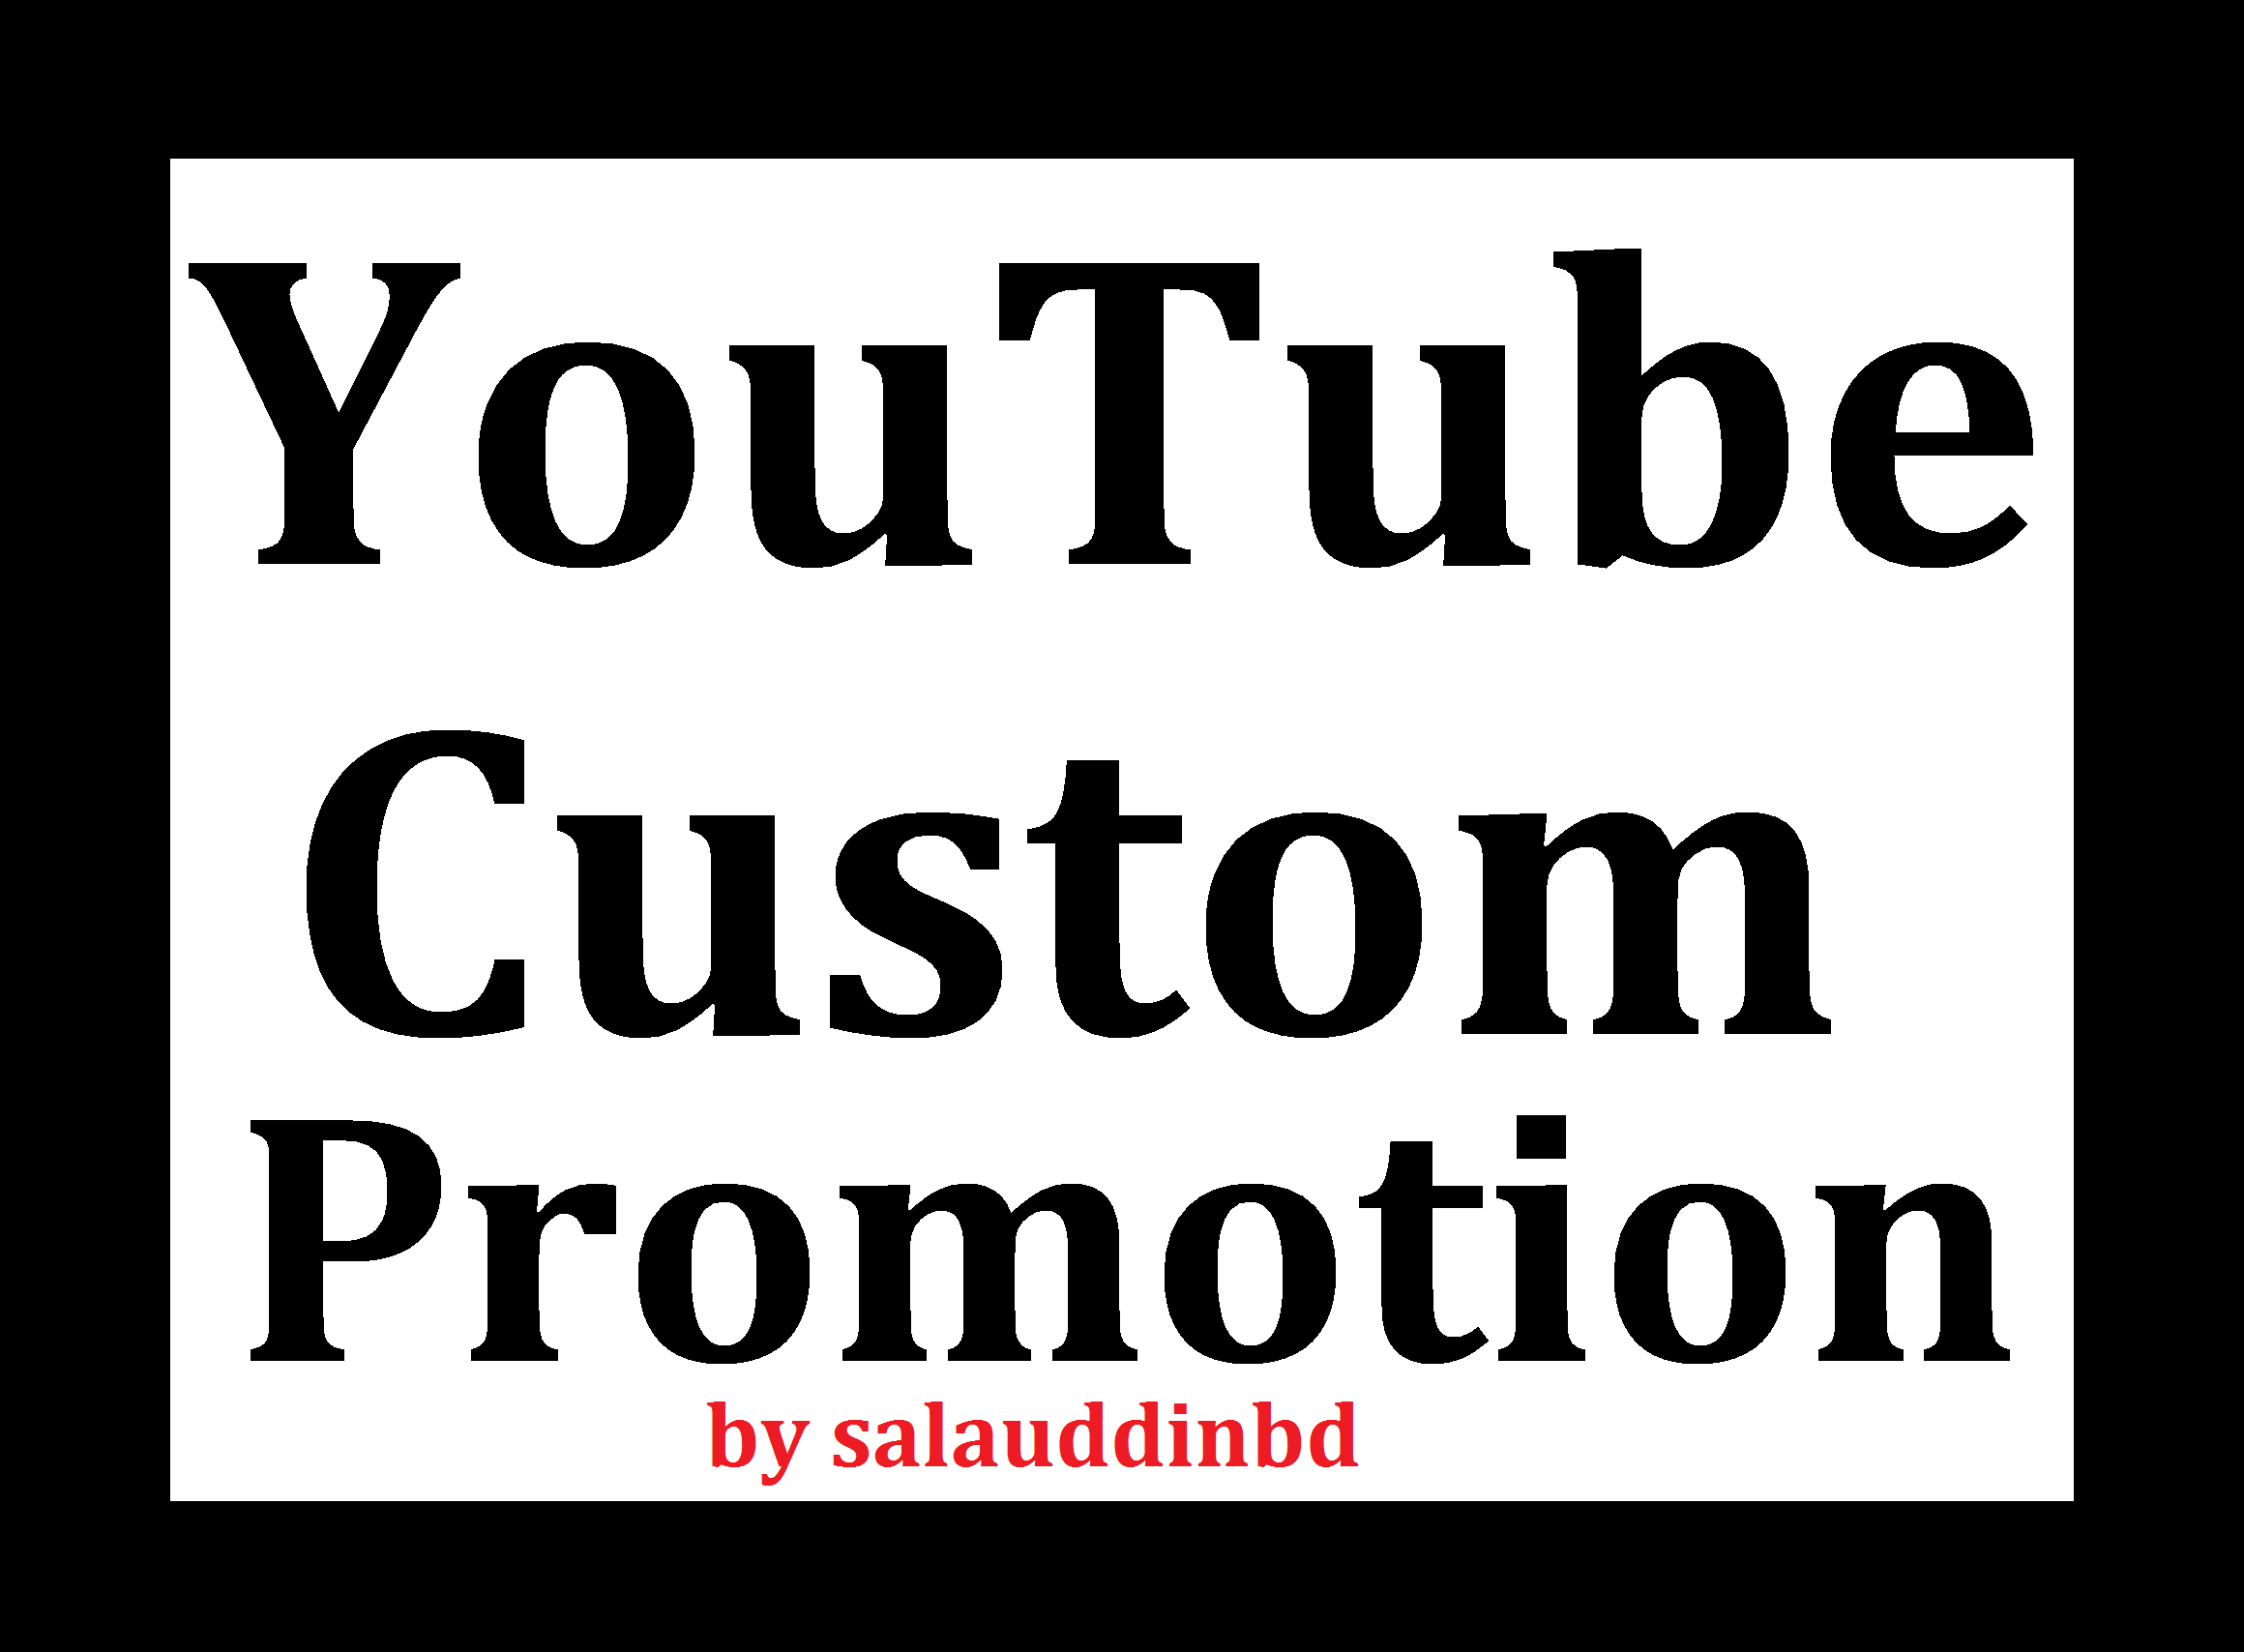 Safe YouTube High Quality Promotion Marketing